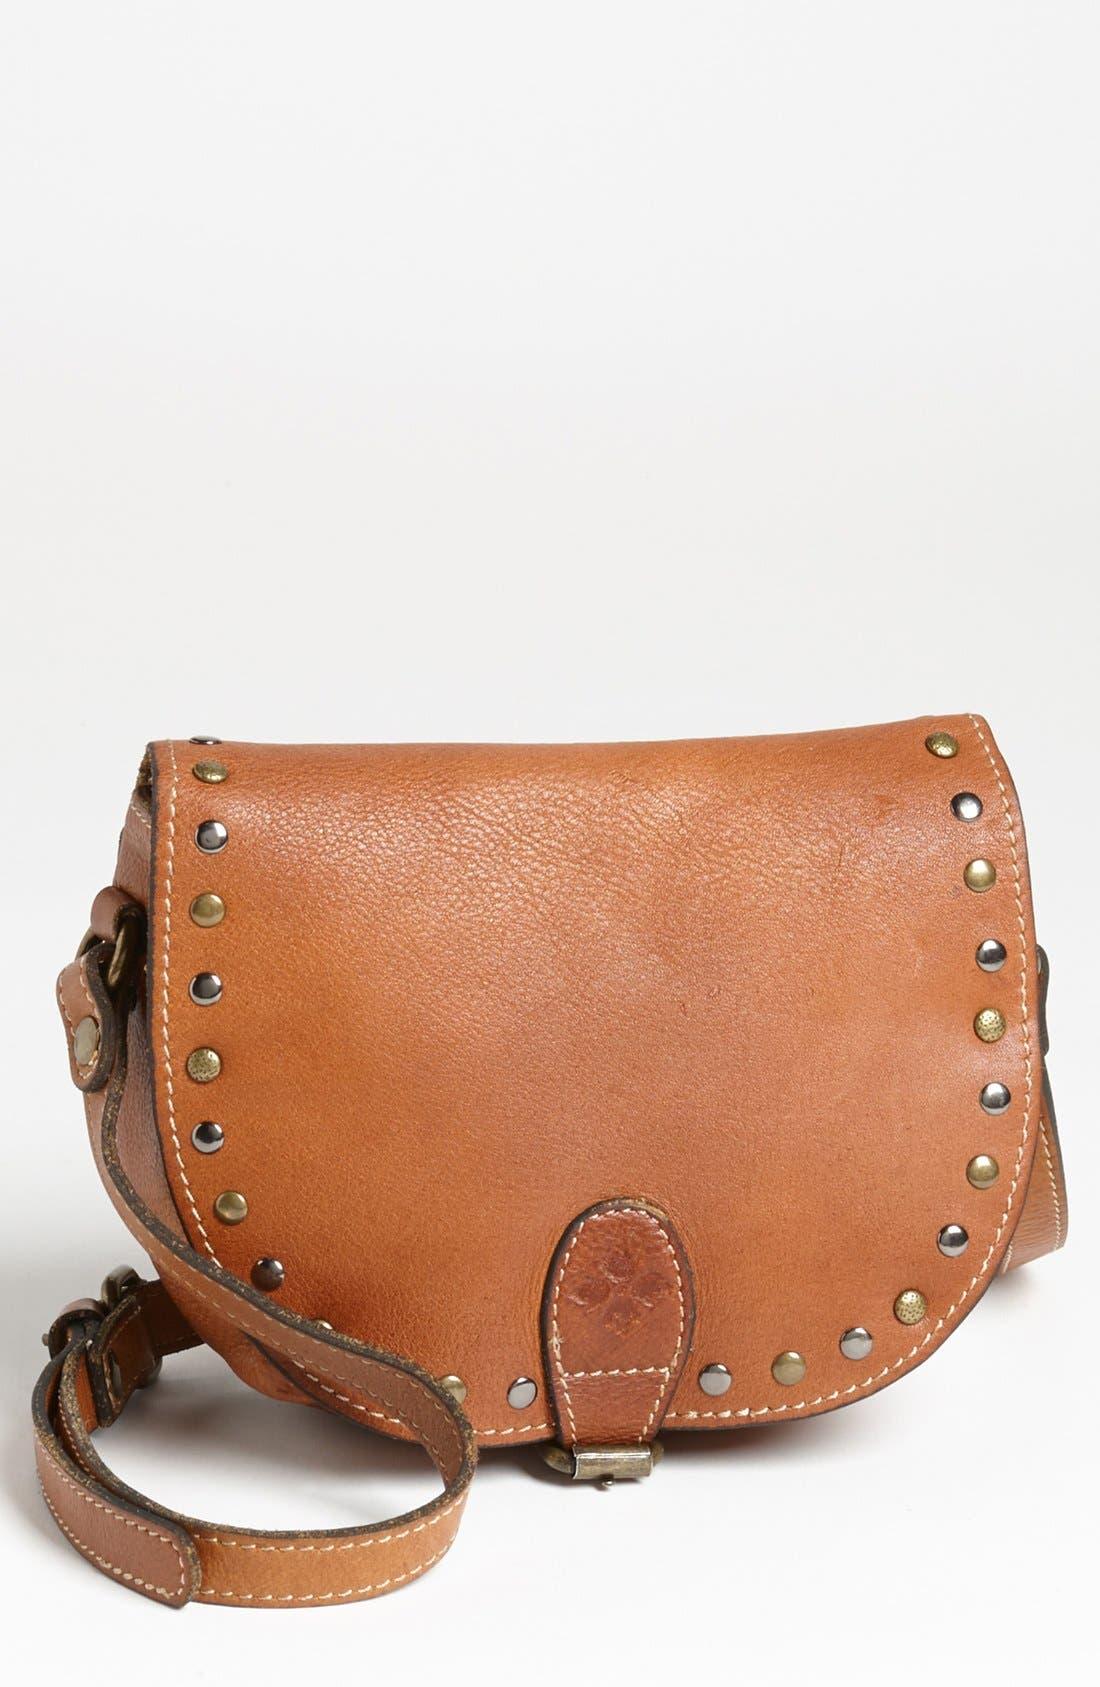 Main Image - Patricia Nash 'Isola - Small' Leather Crossbody Bag